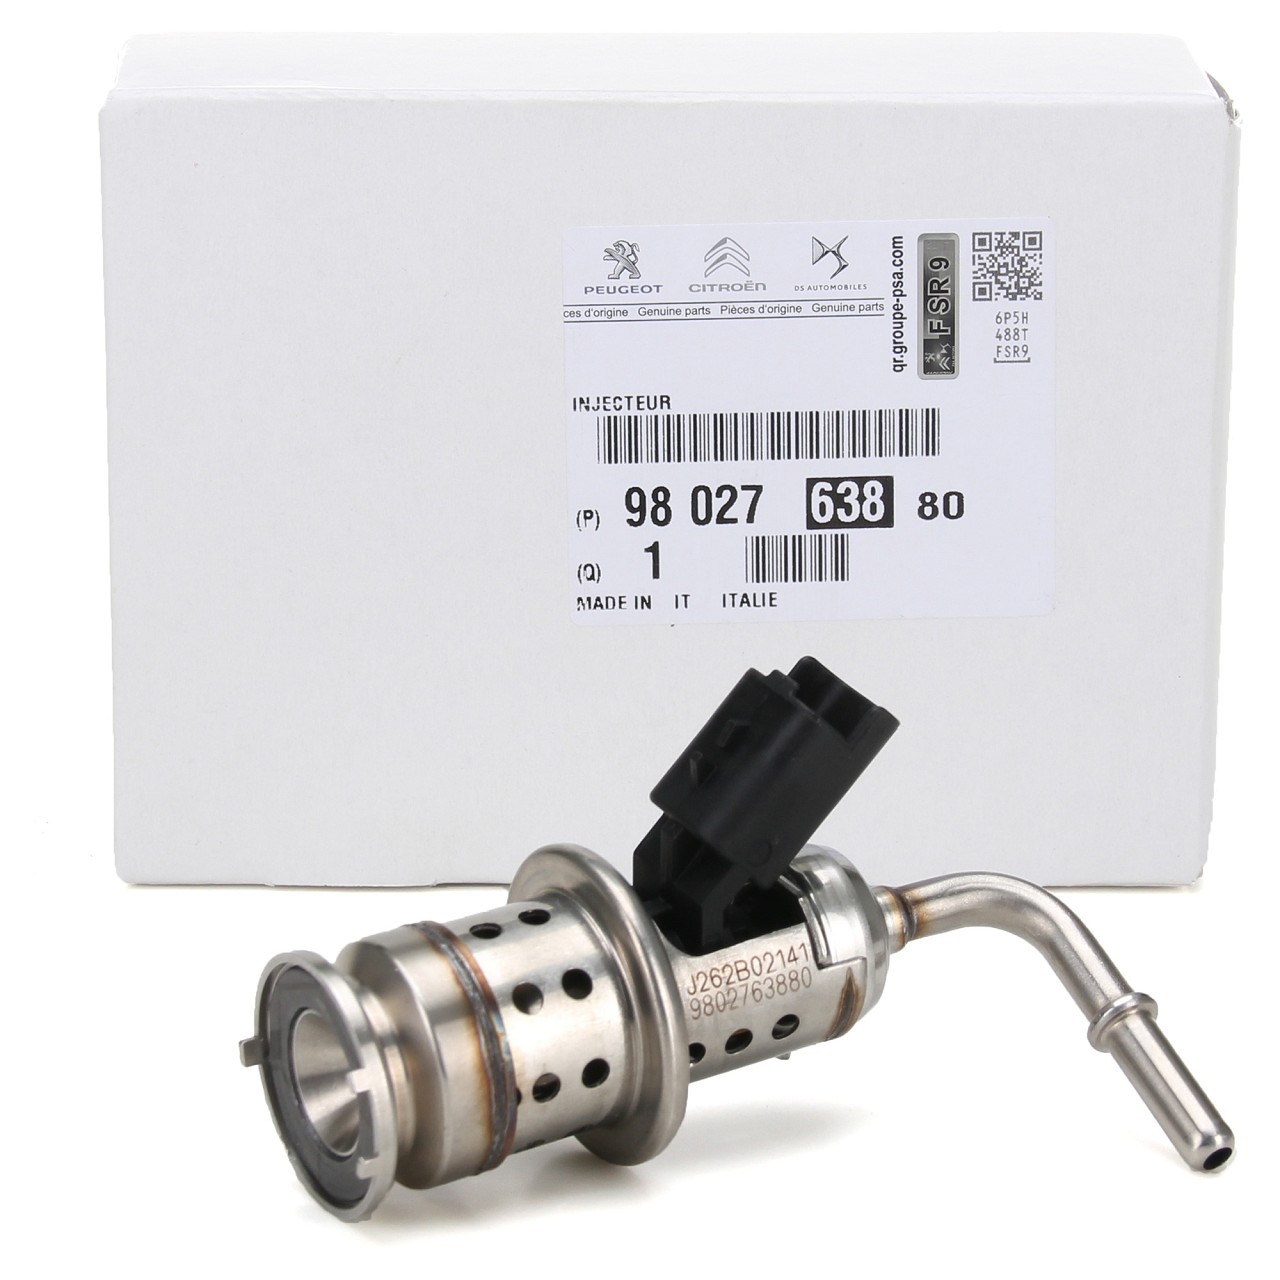 ORIGINAL Citroen Peugeot Einspritzventil Ventil AdBlue C4 308 1.6 HDi 9802763880